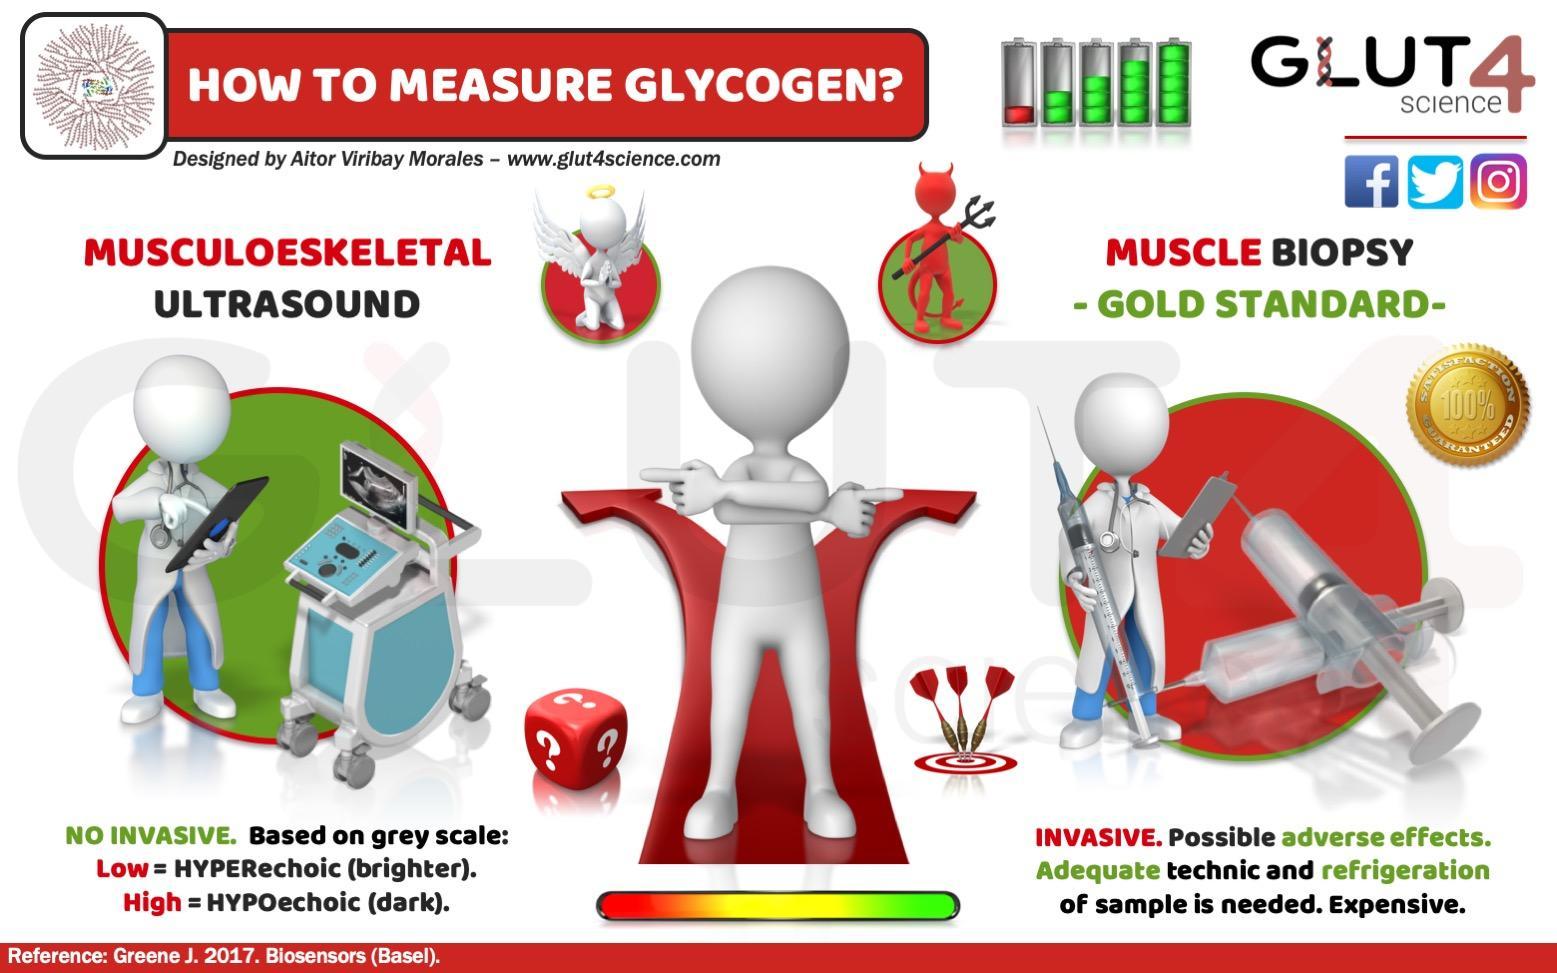 How to measure Glycogen?